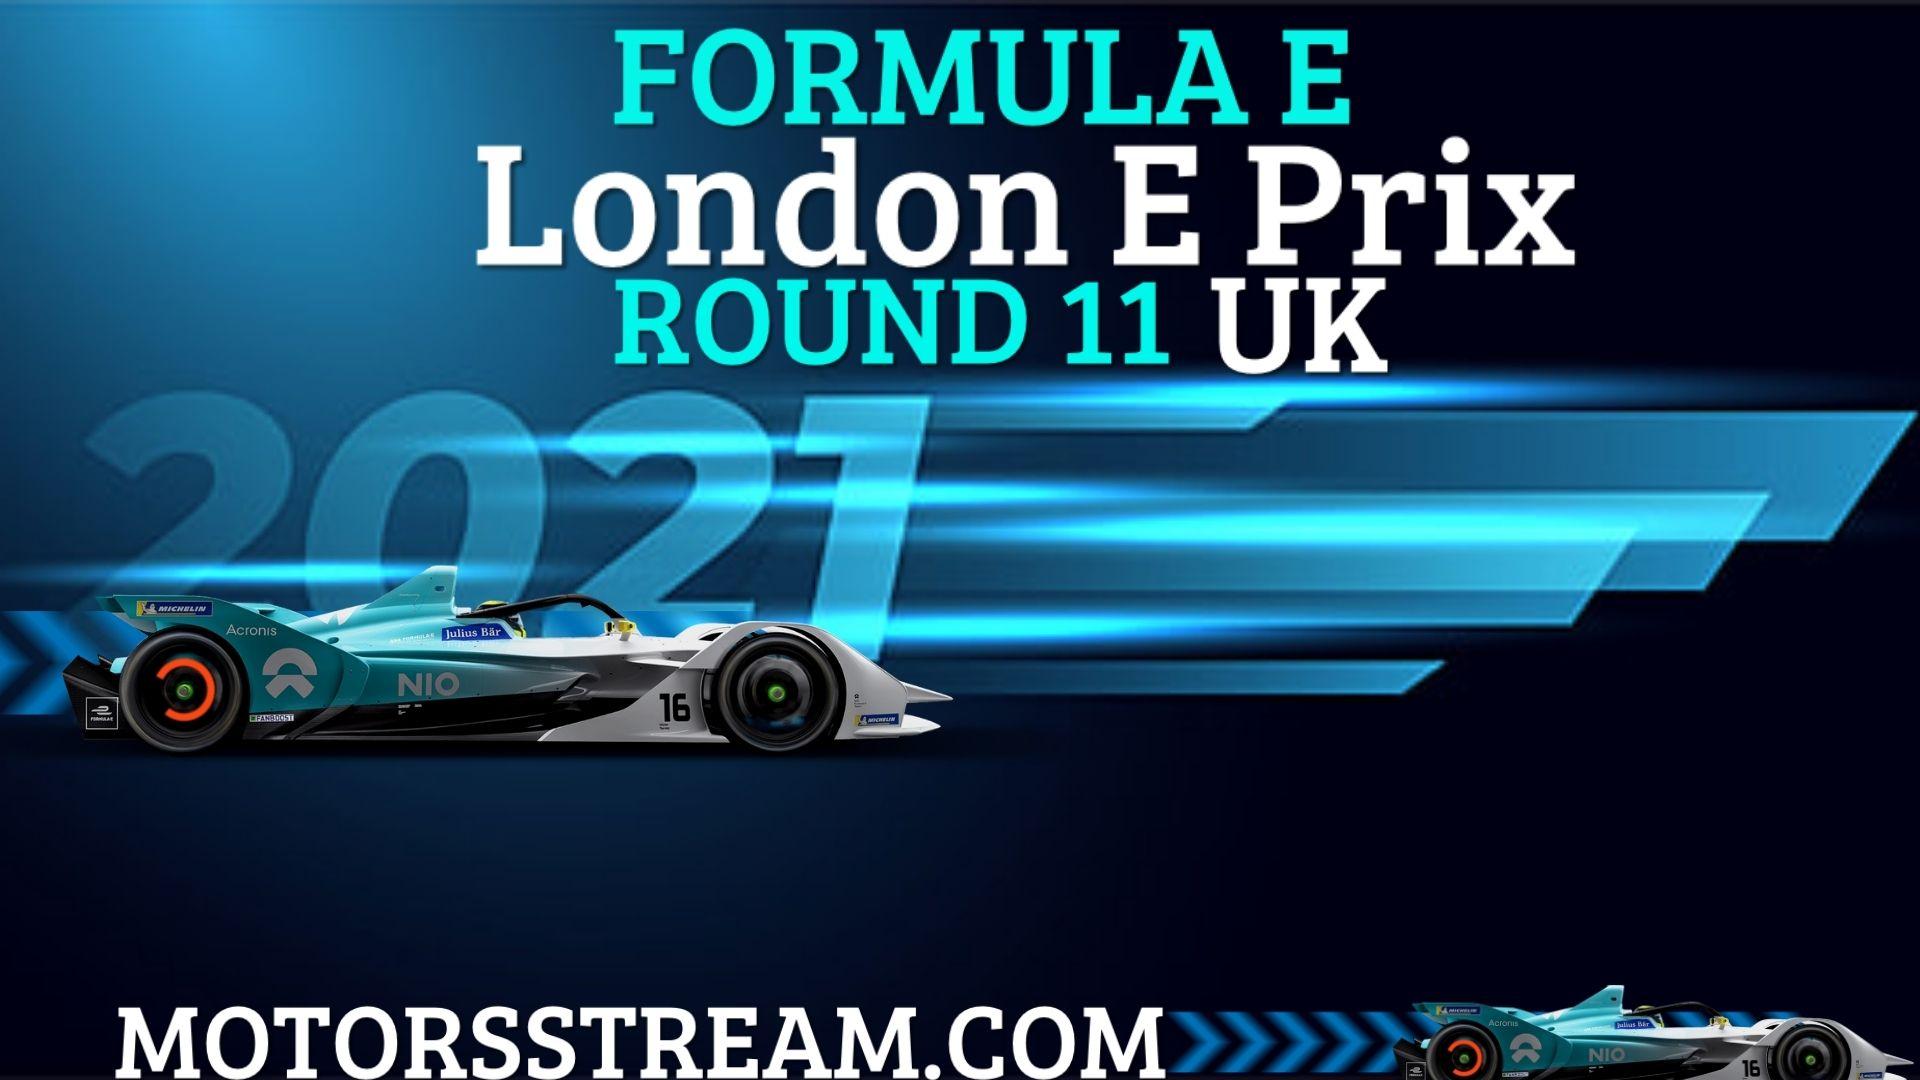 London E Prix Round 11 Live Stream 2021 | Formula E